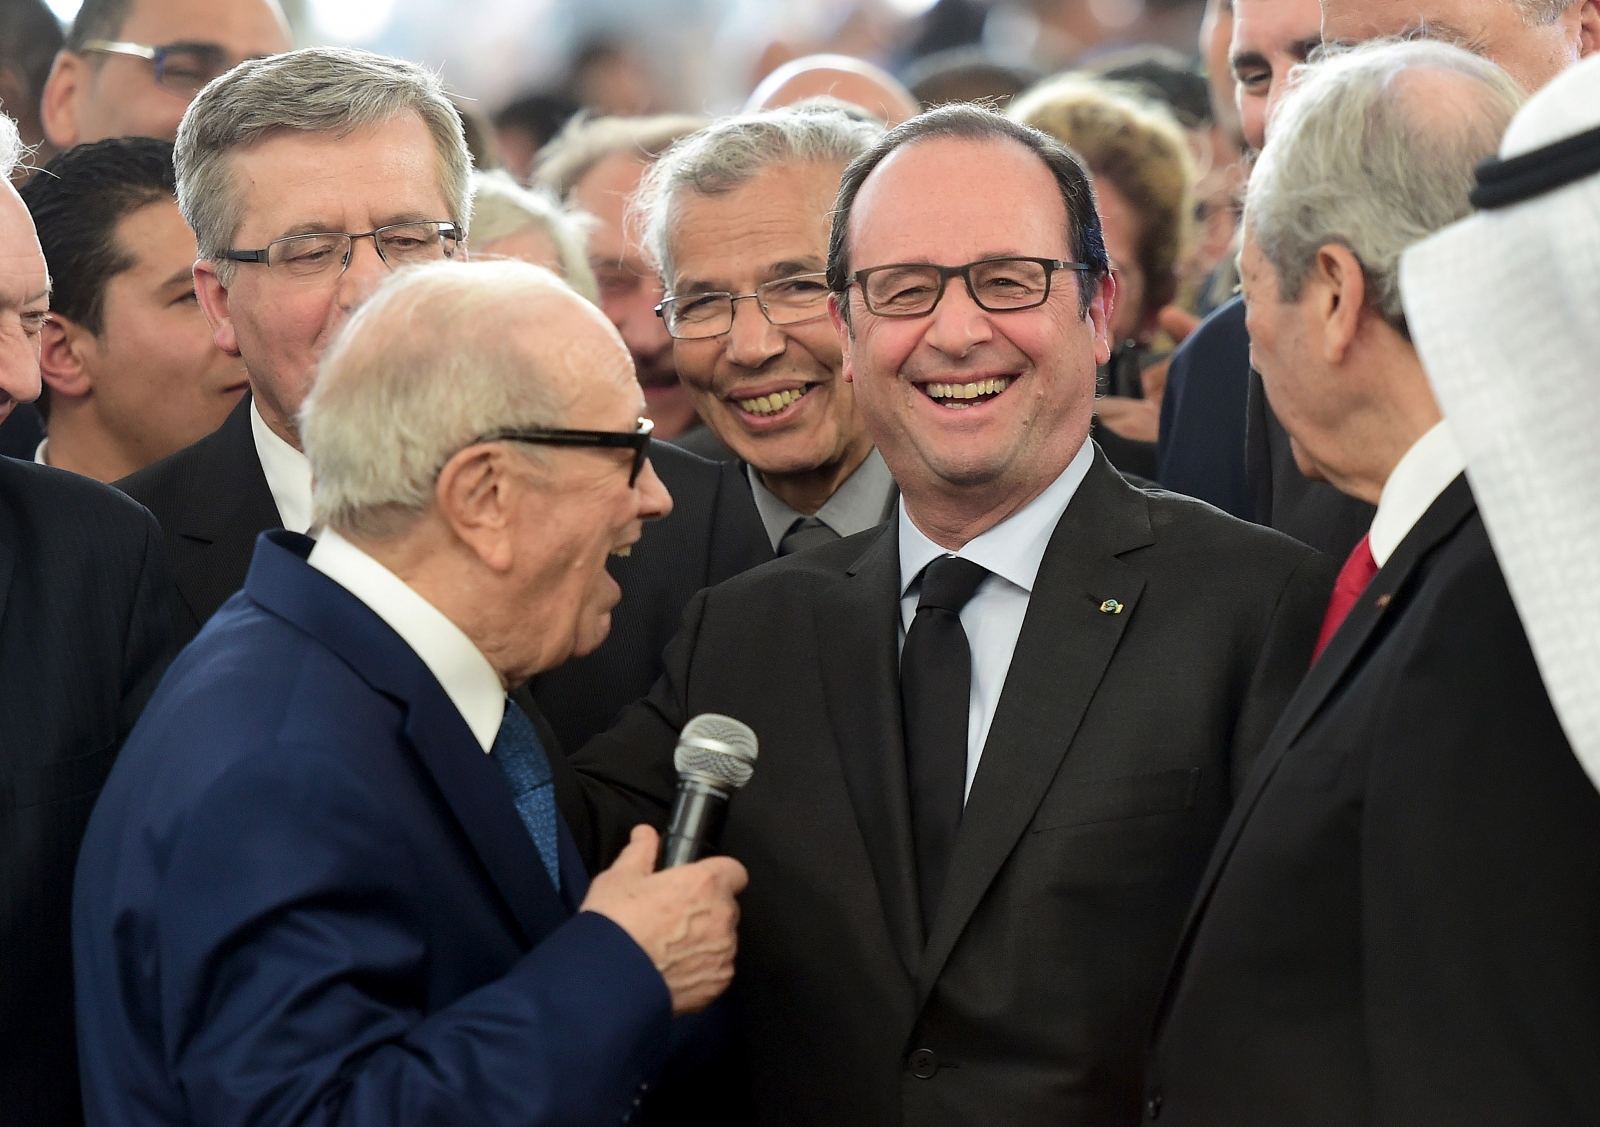 Tunisian president Francois Mitterand Hollande